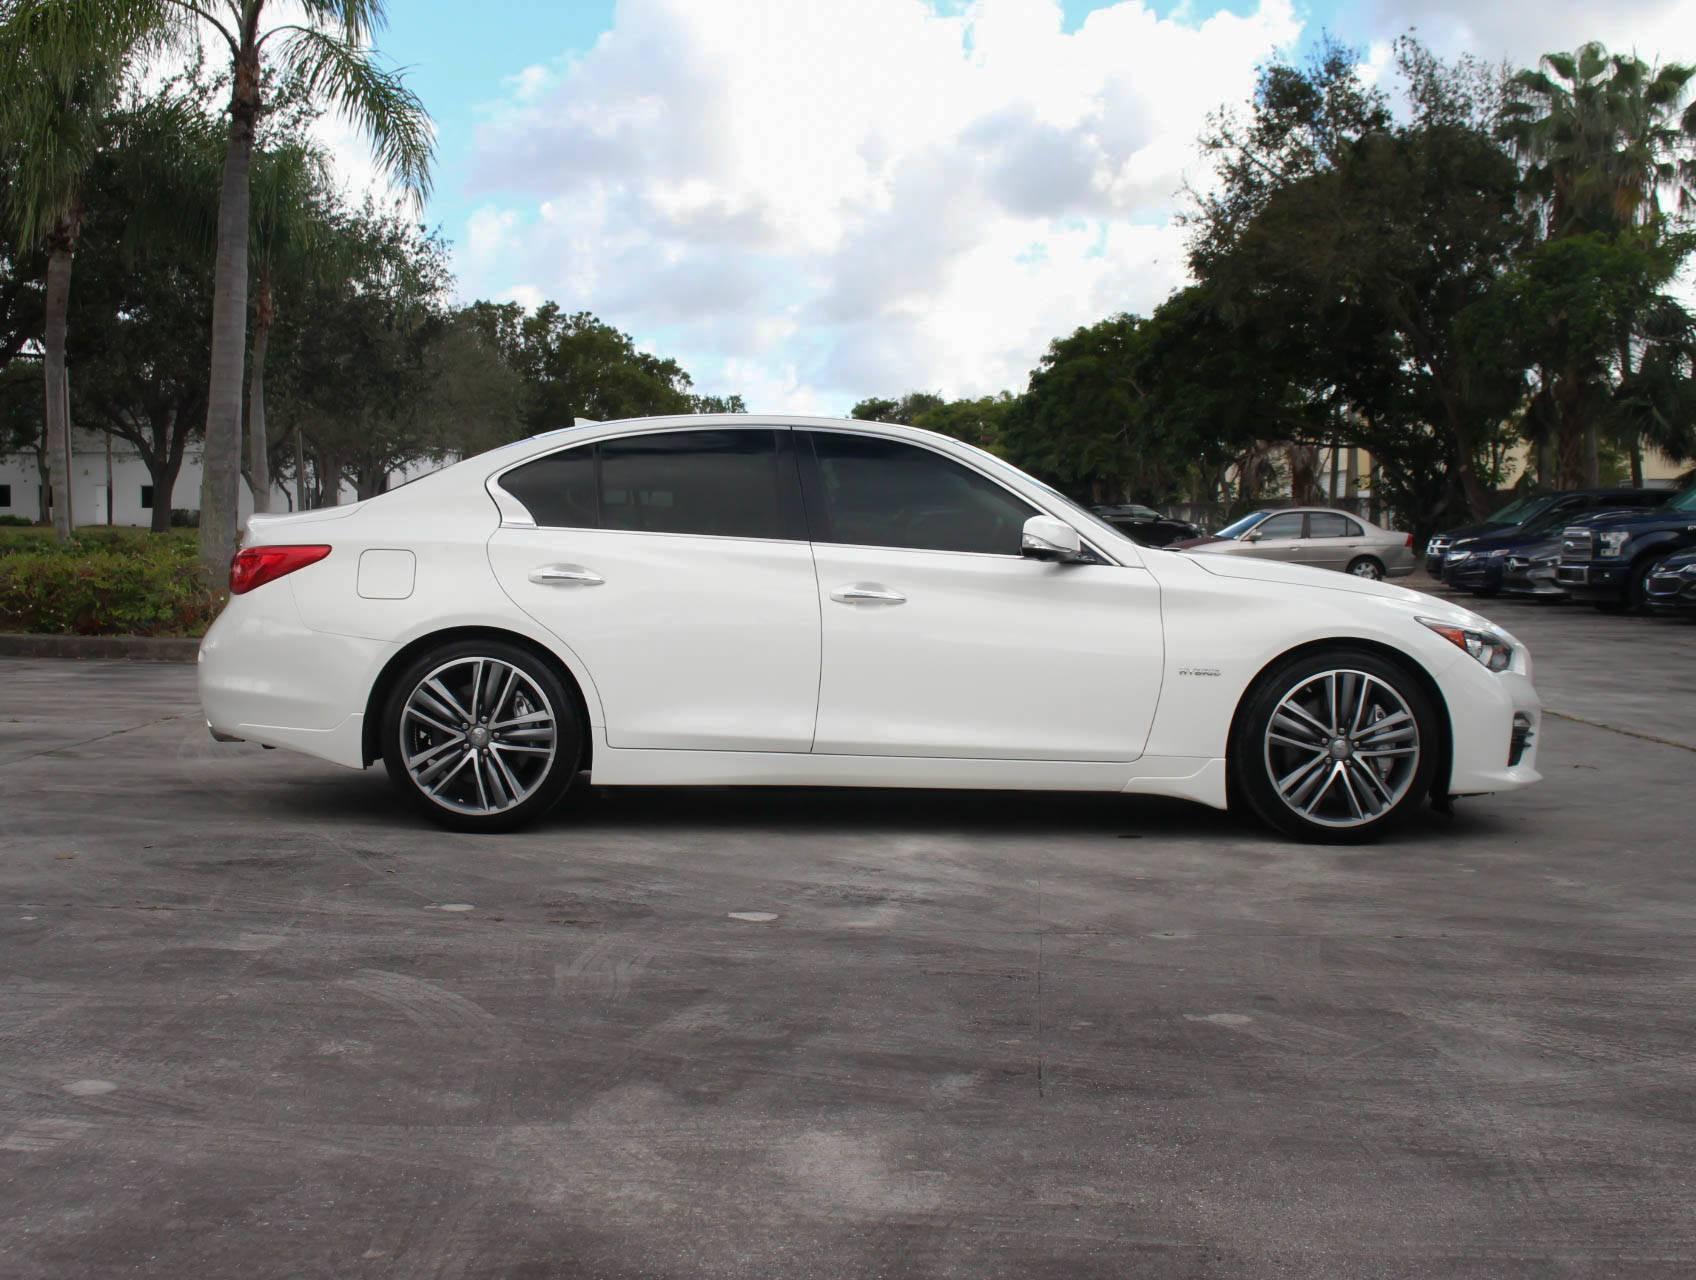 Used Infiniti Q50 For Sale In Miami >> Used 2014 INFINITI Q50s Hybrid Sport Sedan for sale in MIAMI, FL | 91131 | Florida Fine Cars